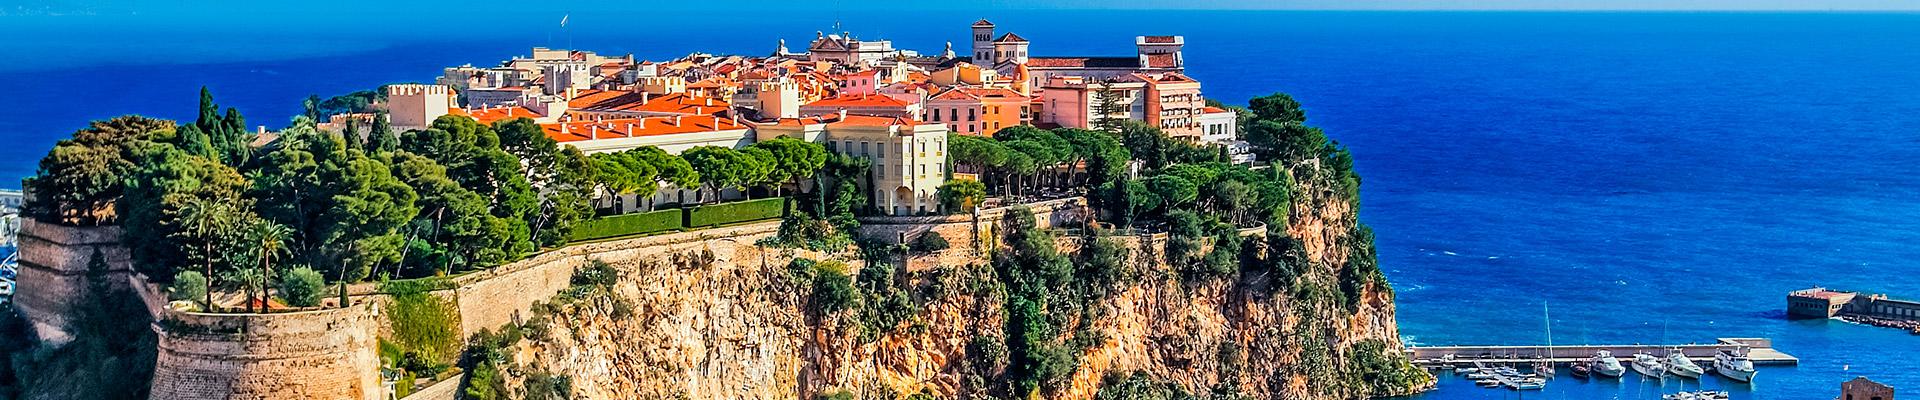 Nizza, Costa Azzurra - Francia